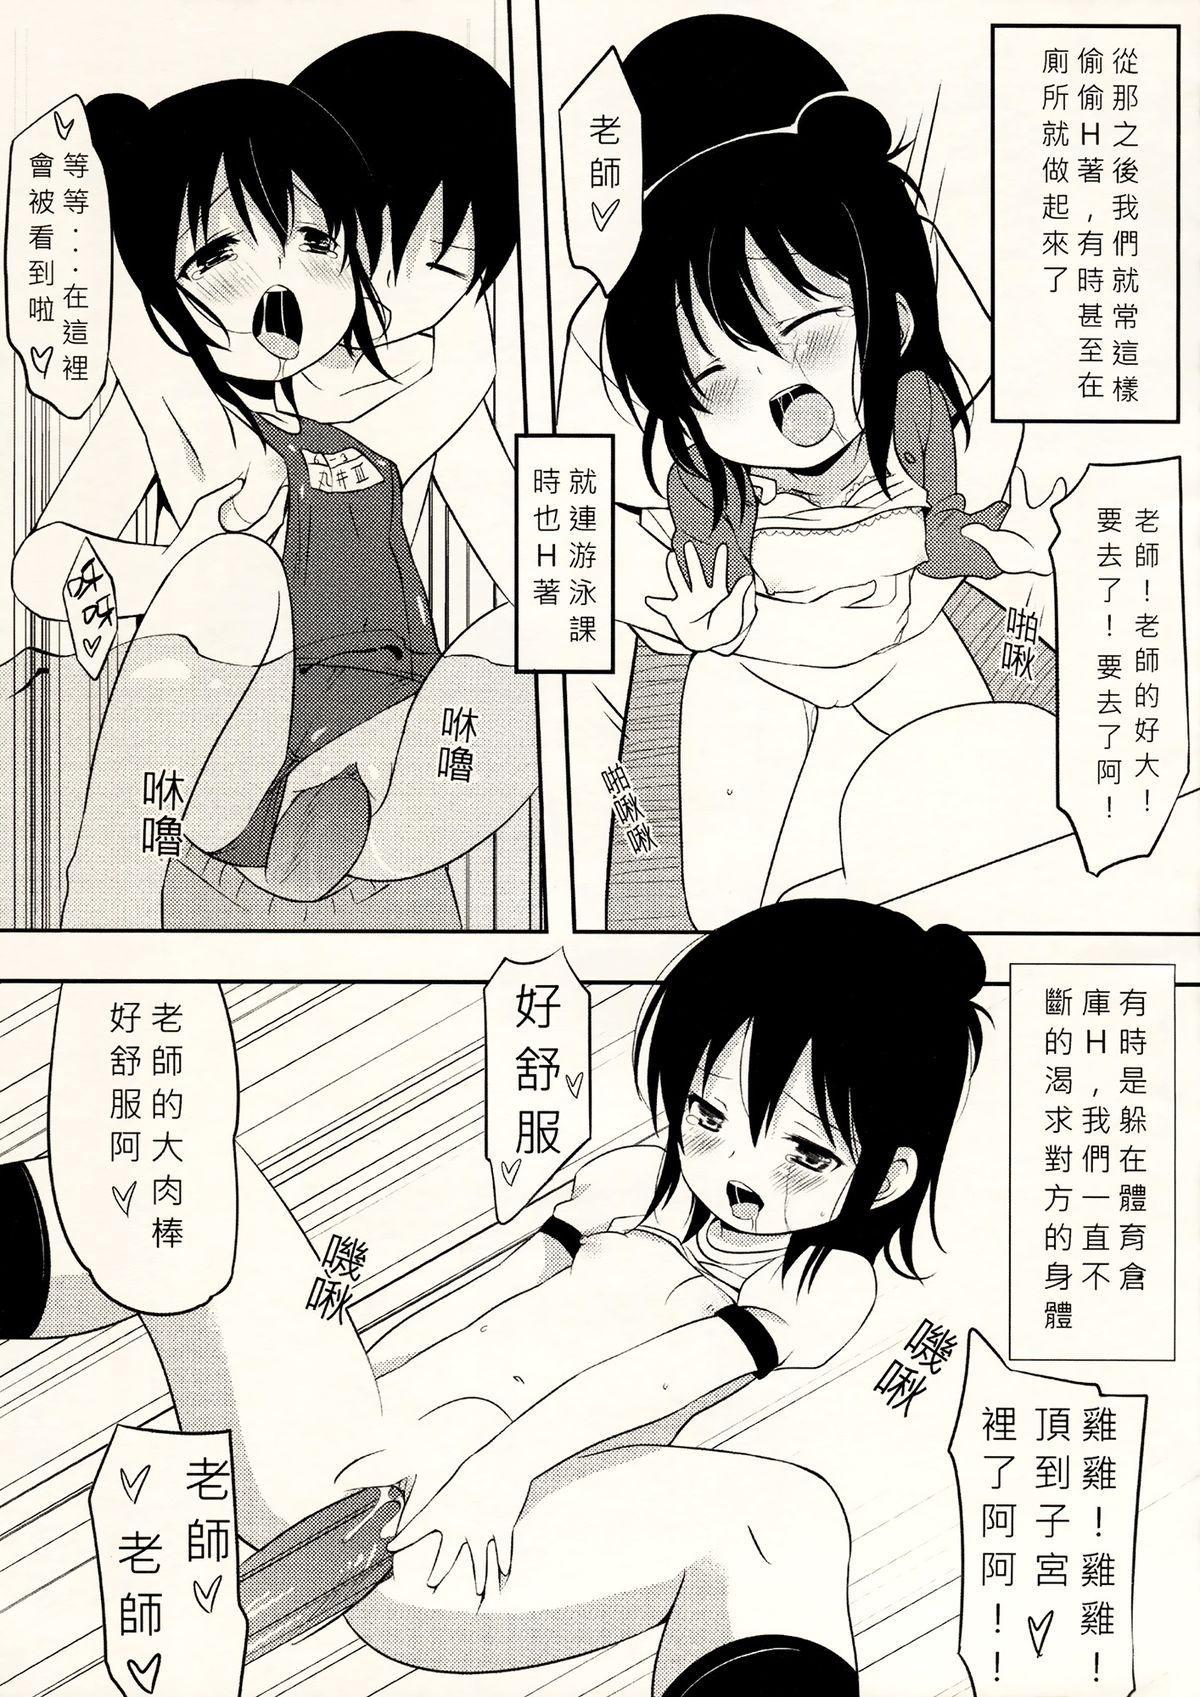 Yousai Hitoha 11